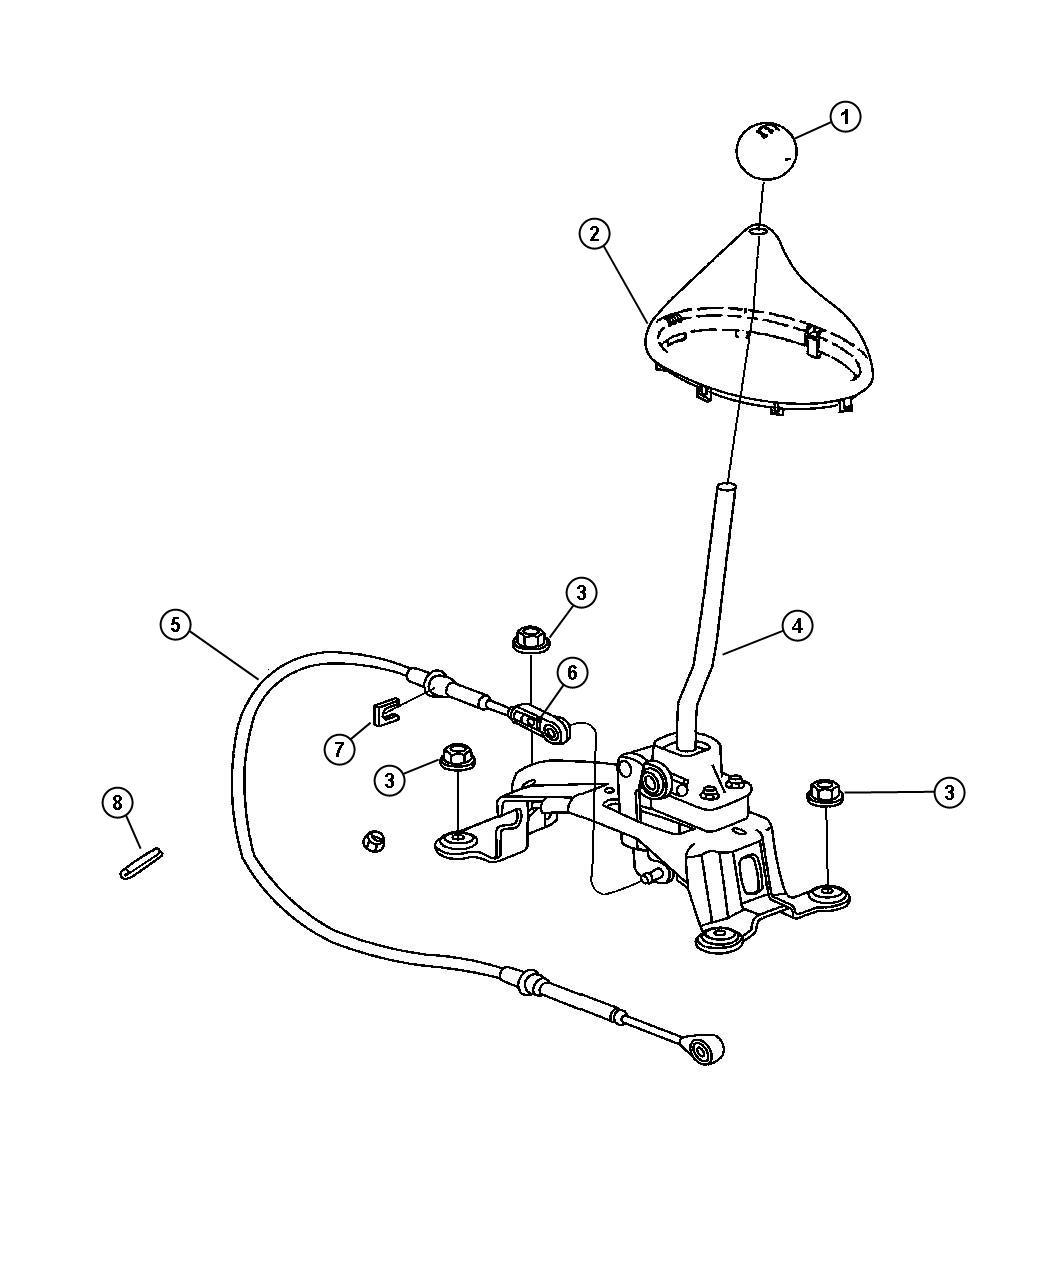 chrysler pt cruiser knob  gearshift  trim   all trim codes  color   pastel slate gray